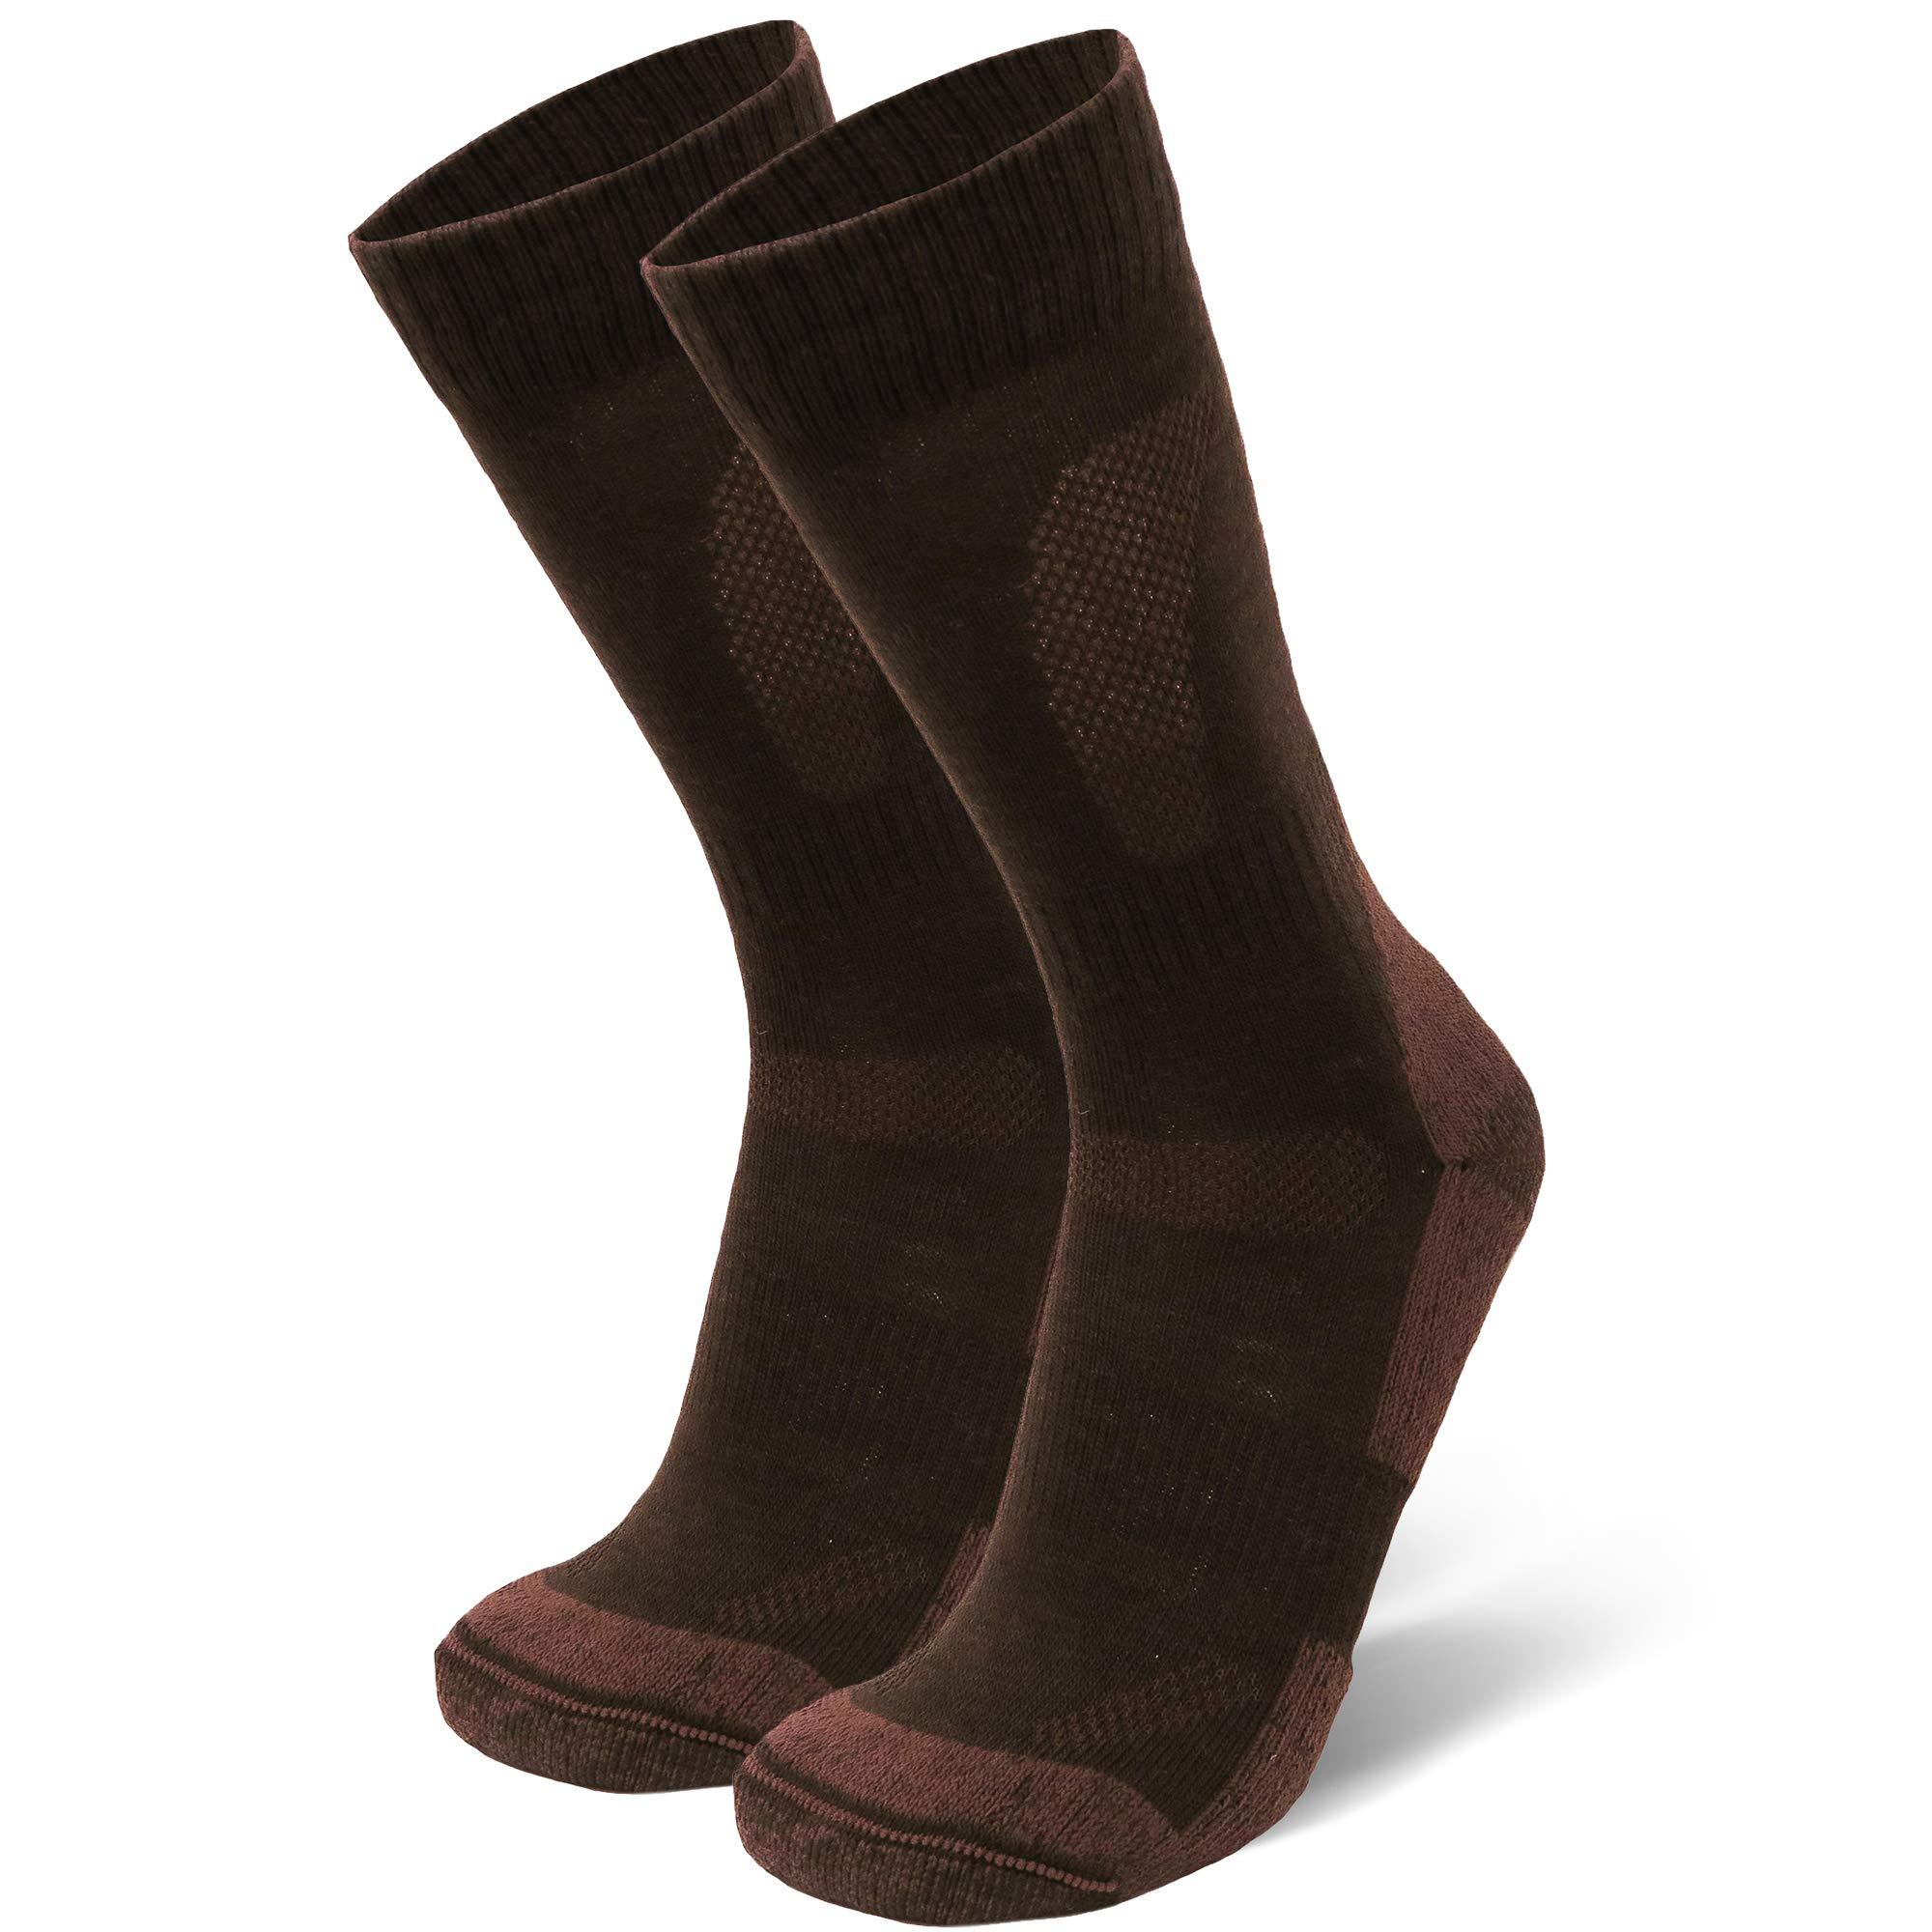 DANISH ENDURANCE Merino Wool Hiking & Trekking Socks (Oak Brown 1 Pair, US Women 8-10 // US Men 6.5-8.5) by DANISH ENDURANCE